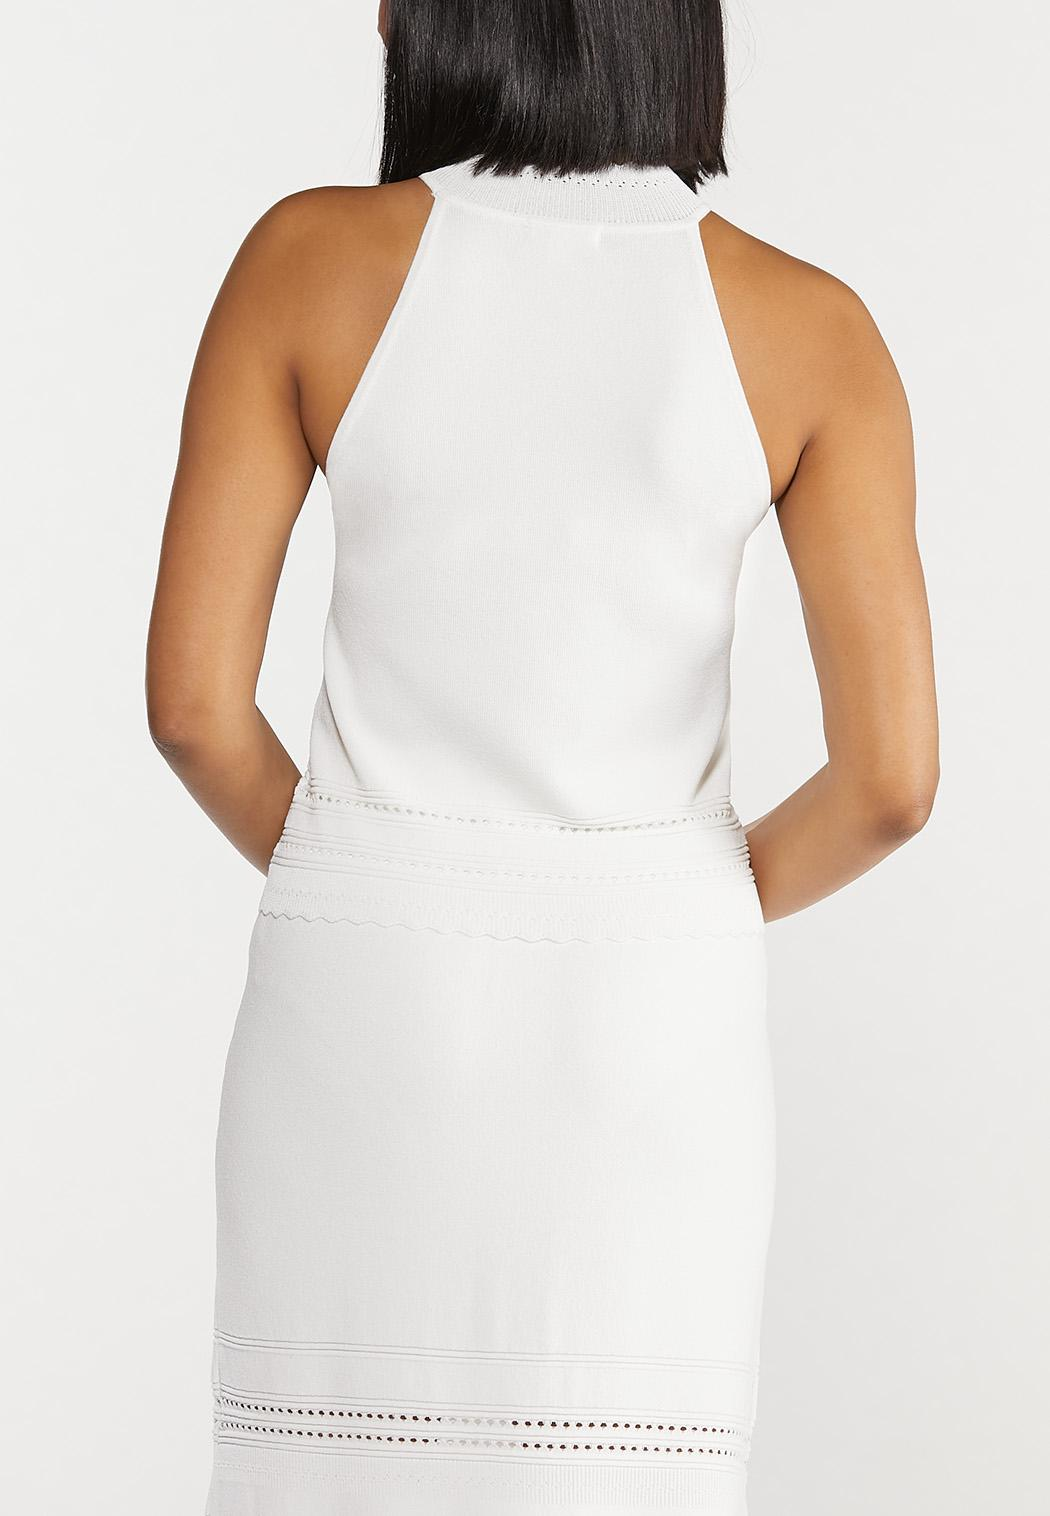 Plus Size Ivory Halter Knit Top (Item #44545156)